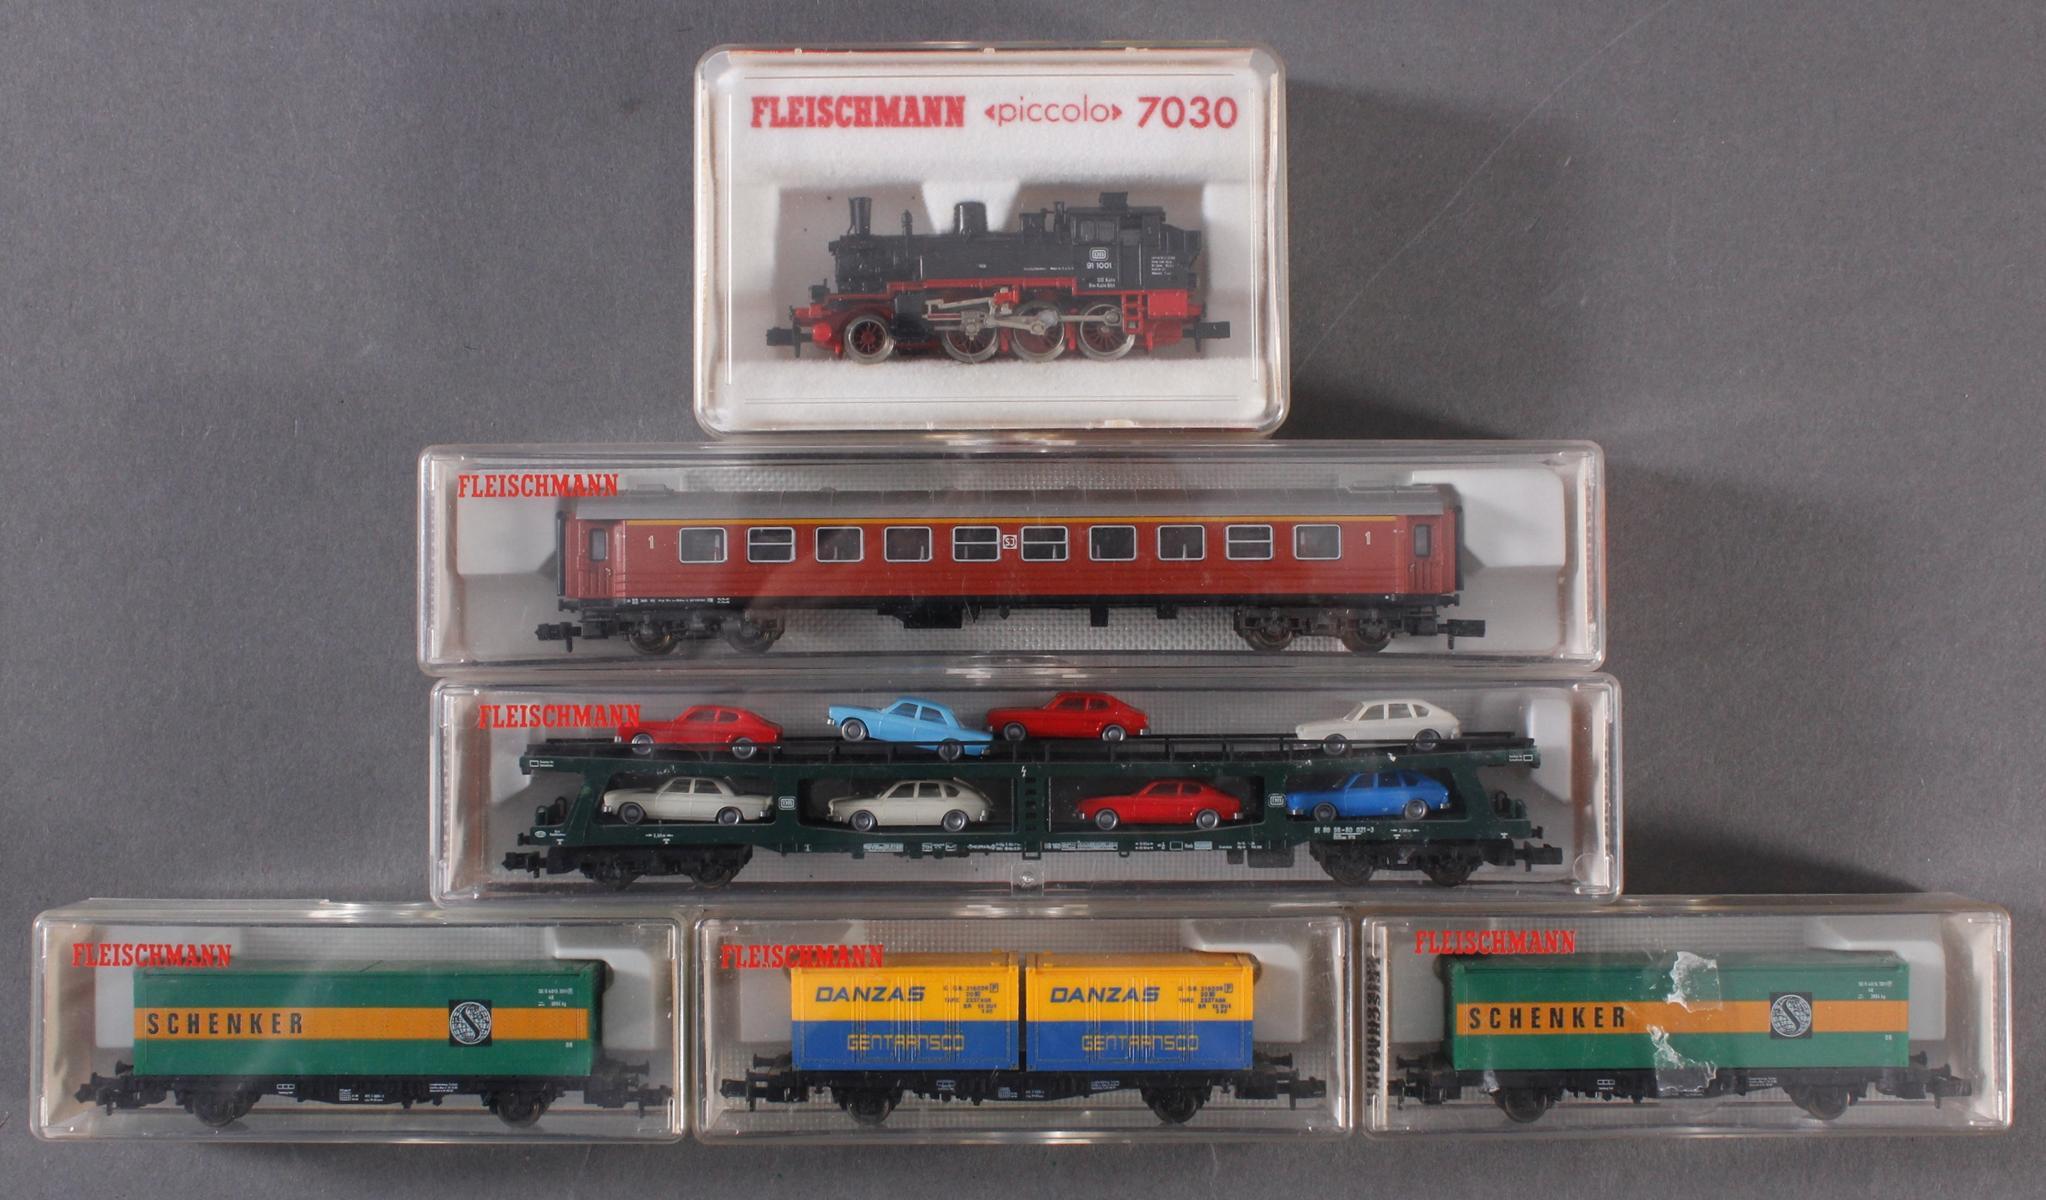 Fleischmann Dampf-Lok Piccolo 7030 mit 5 Waggons